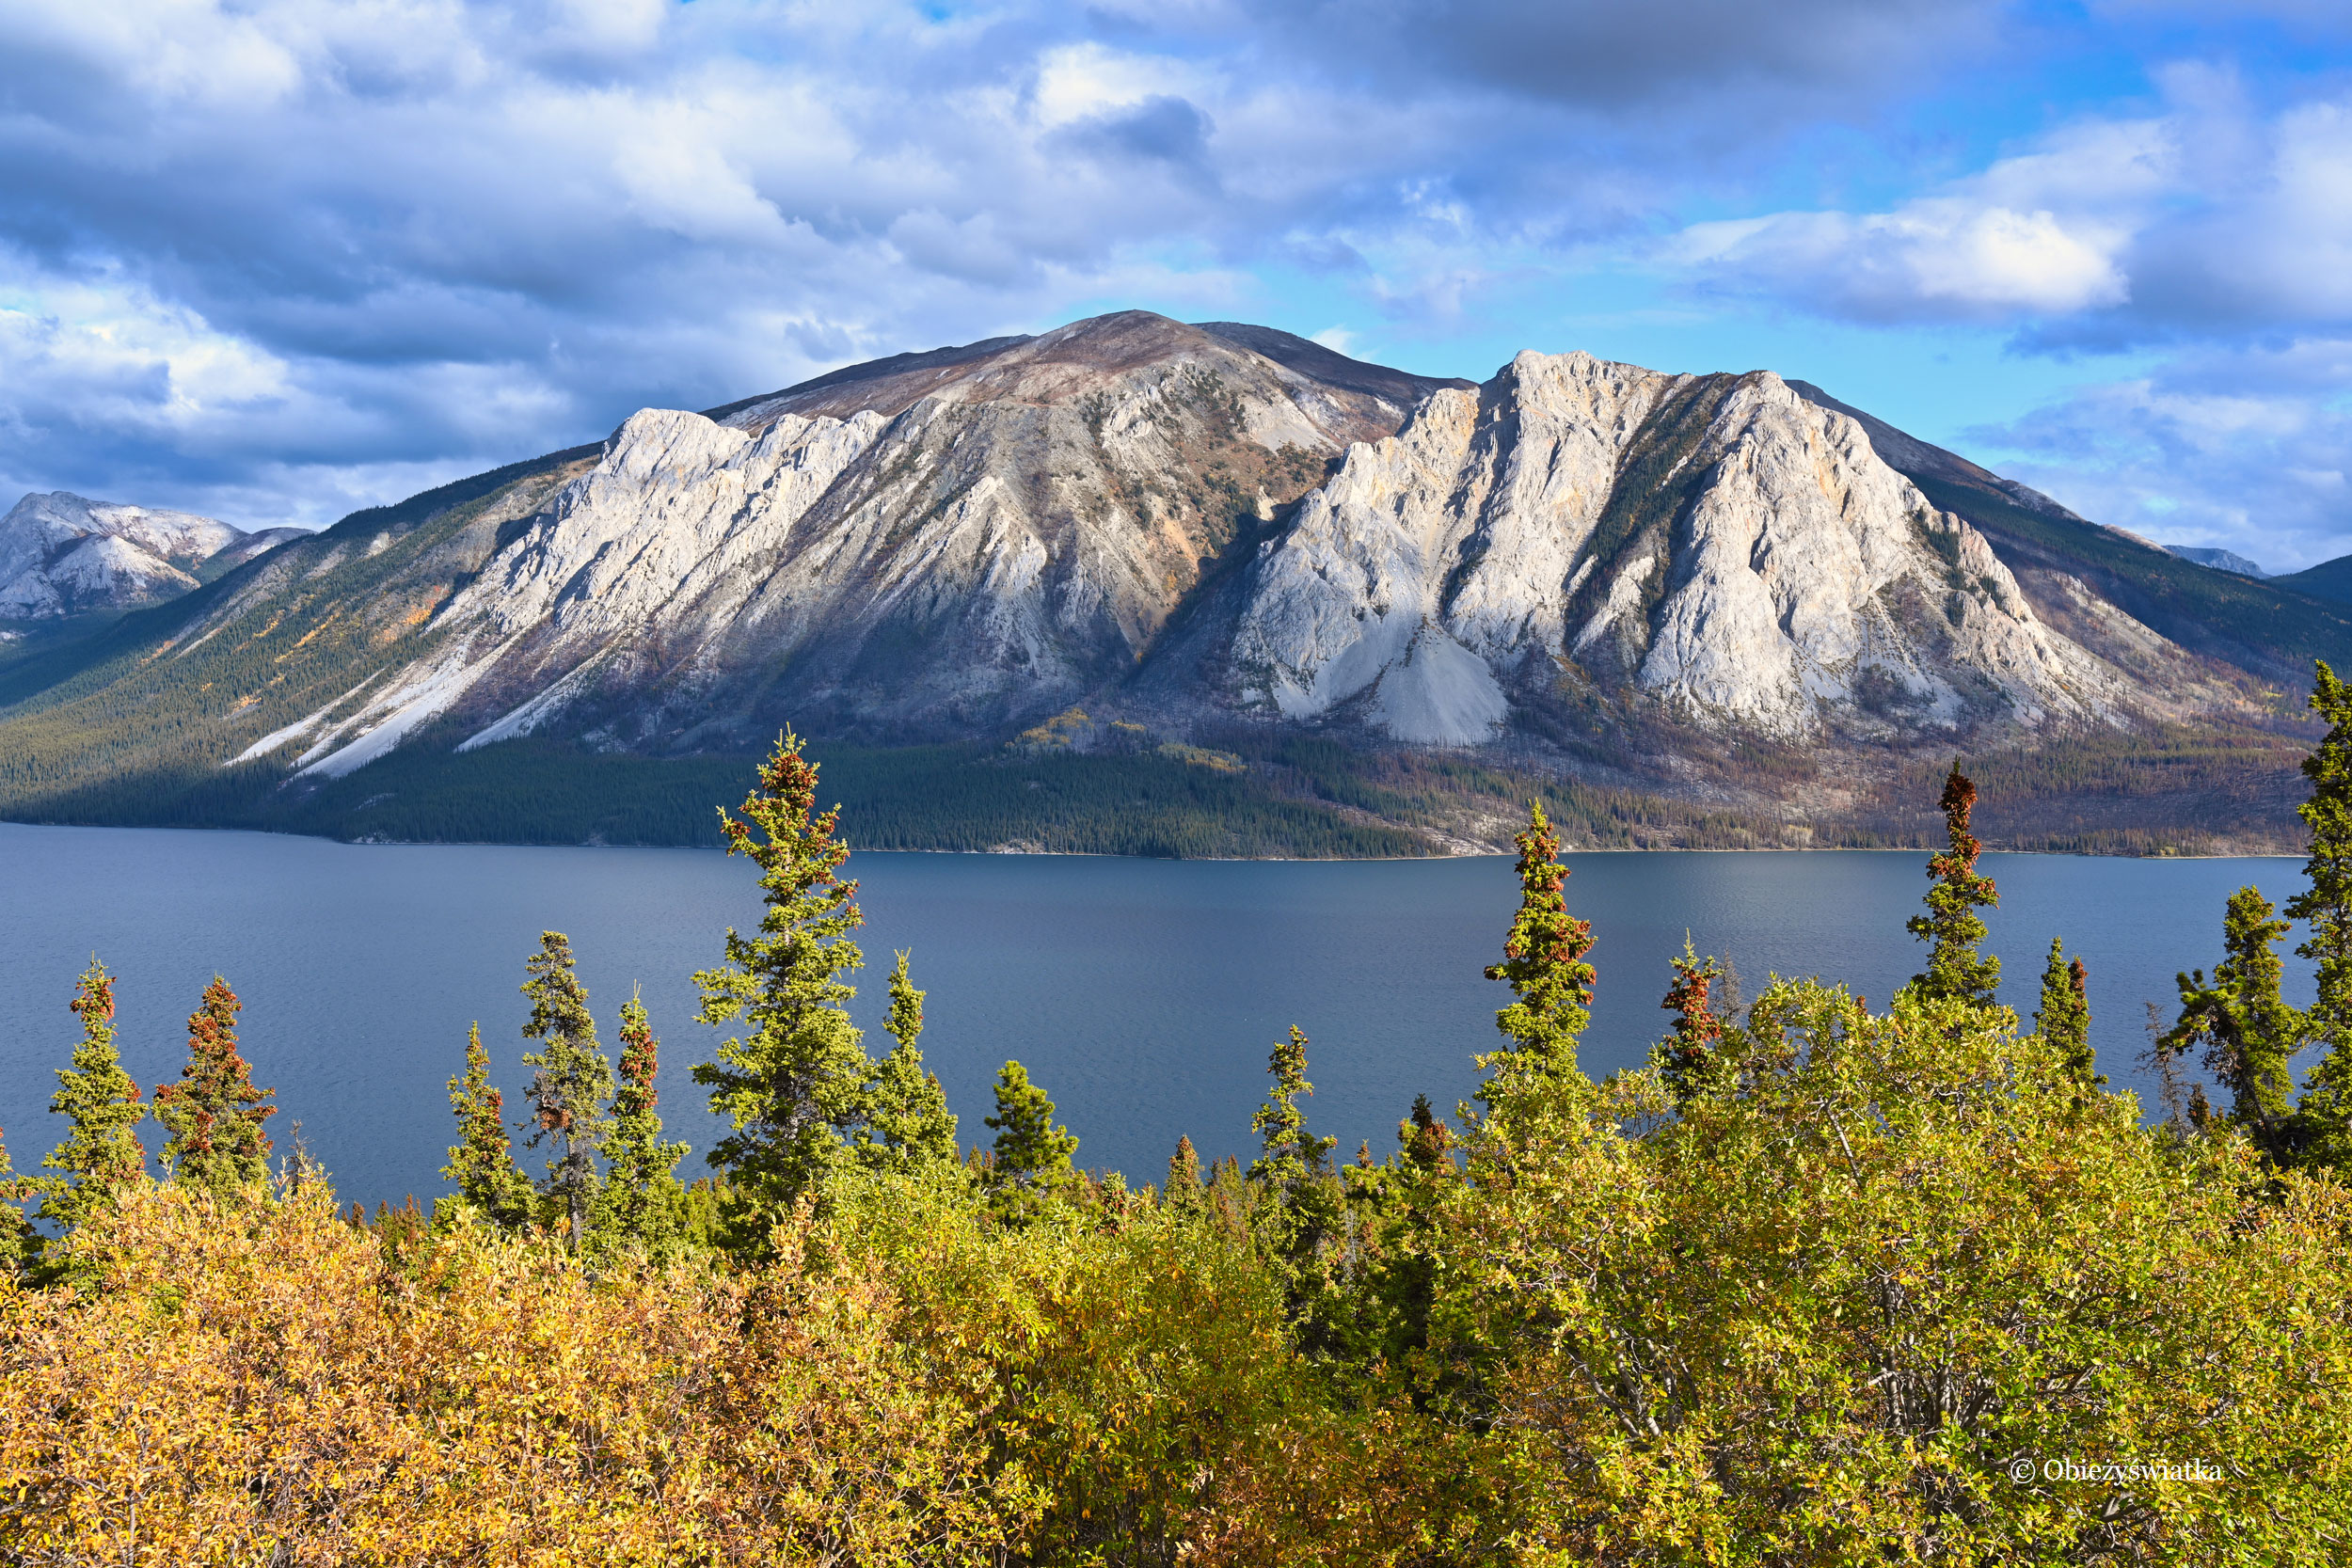 Góry wokół Tagish Lake, Kanada